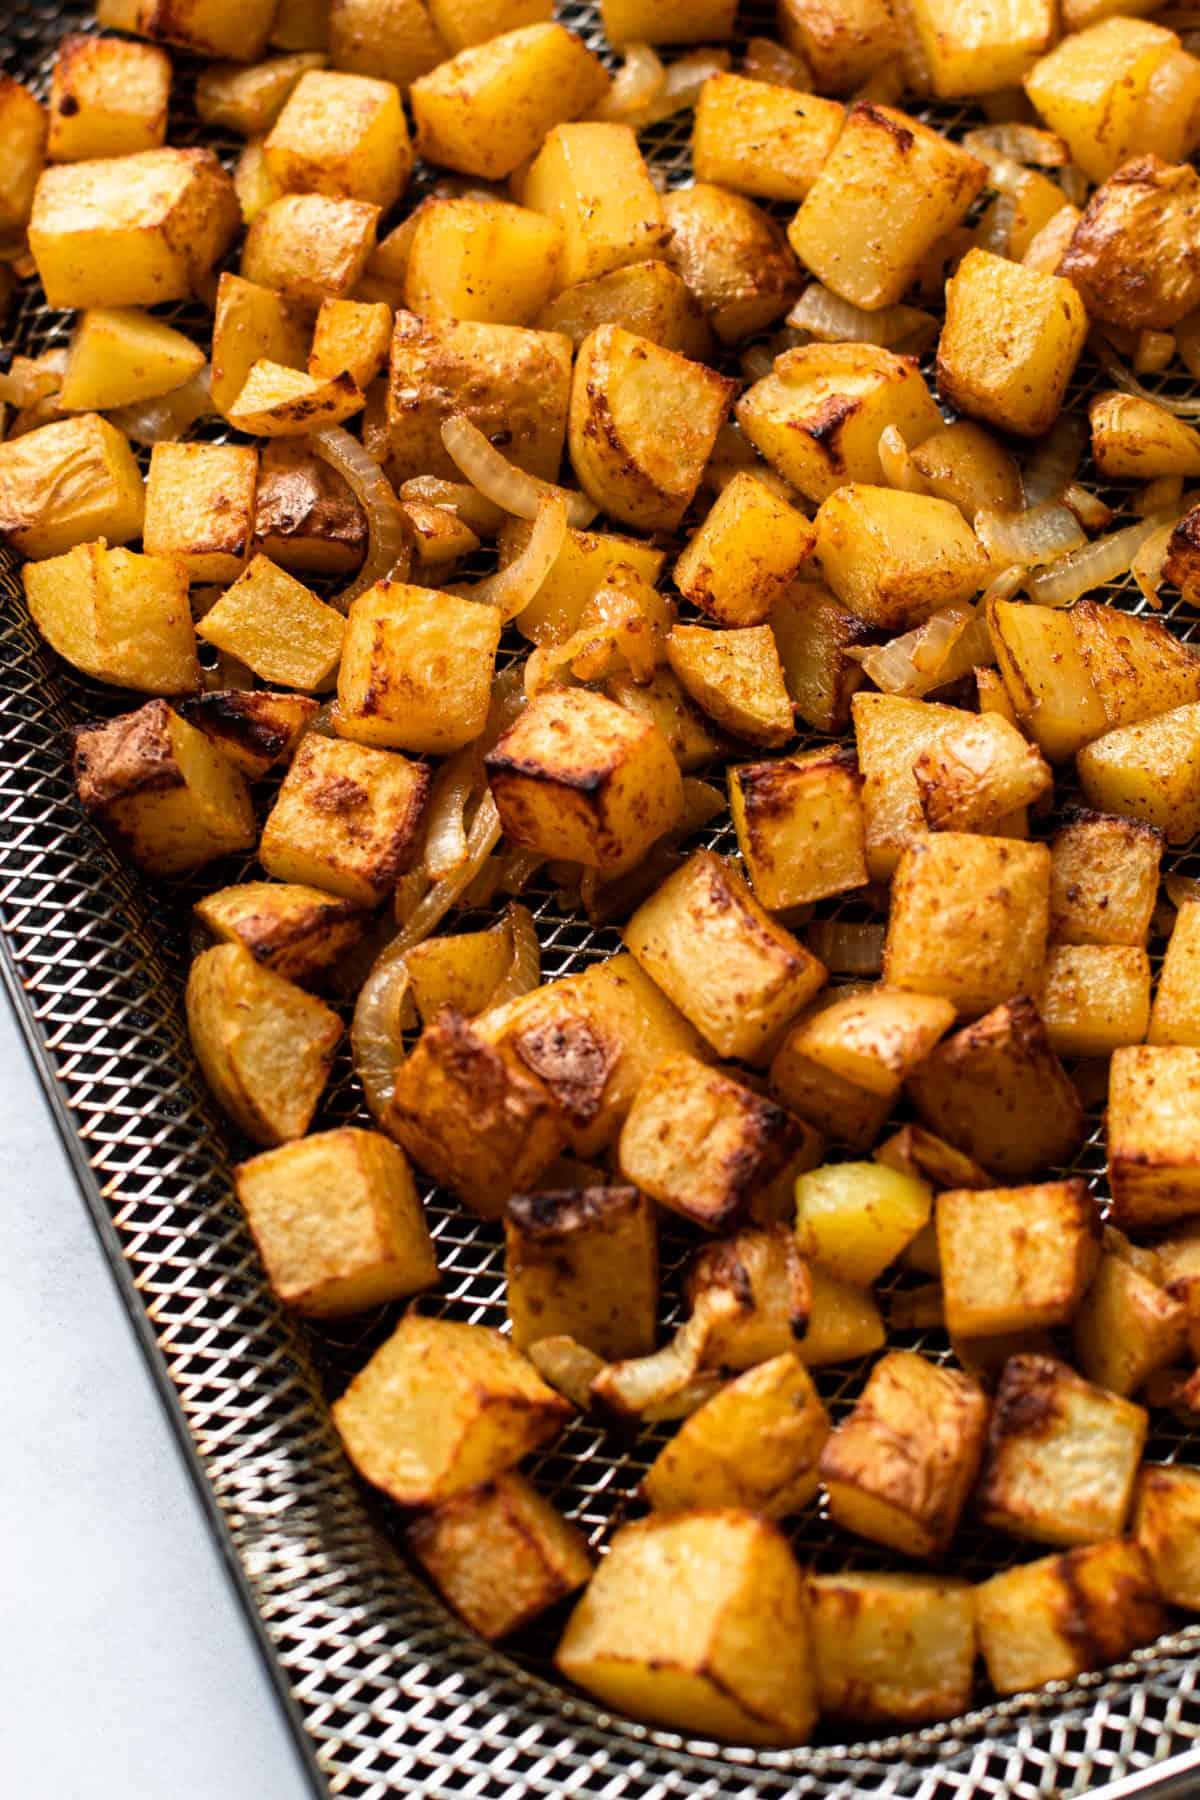 Crispy air fried potatoes still in the basket.